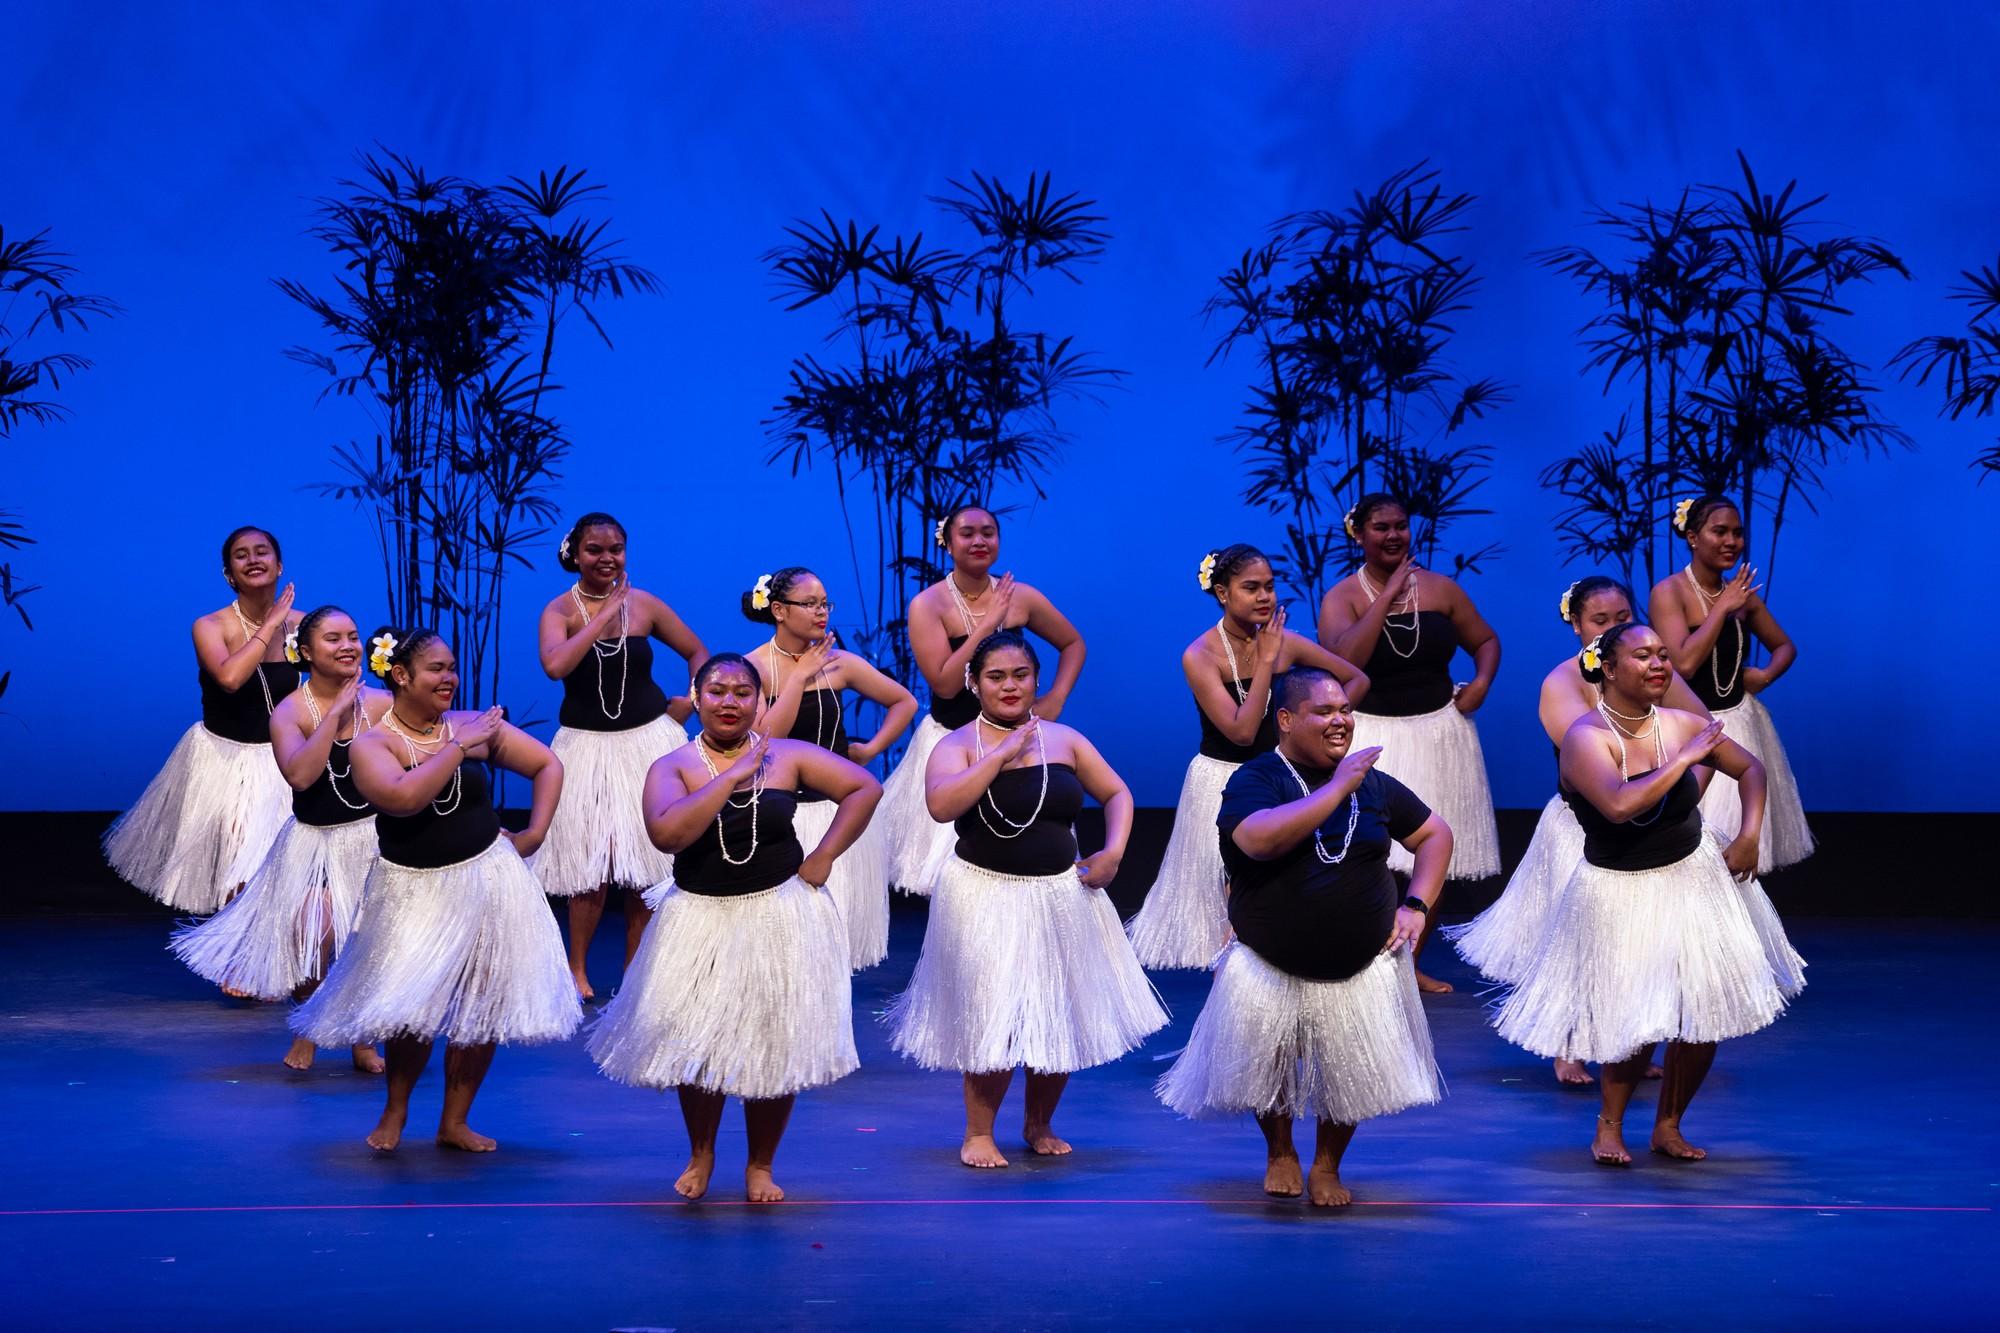 Large group of women dancers in white skirts, black tops, blue lighting.